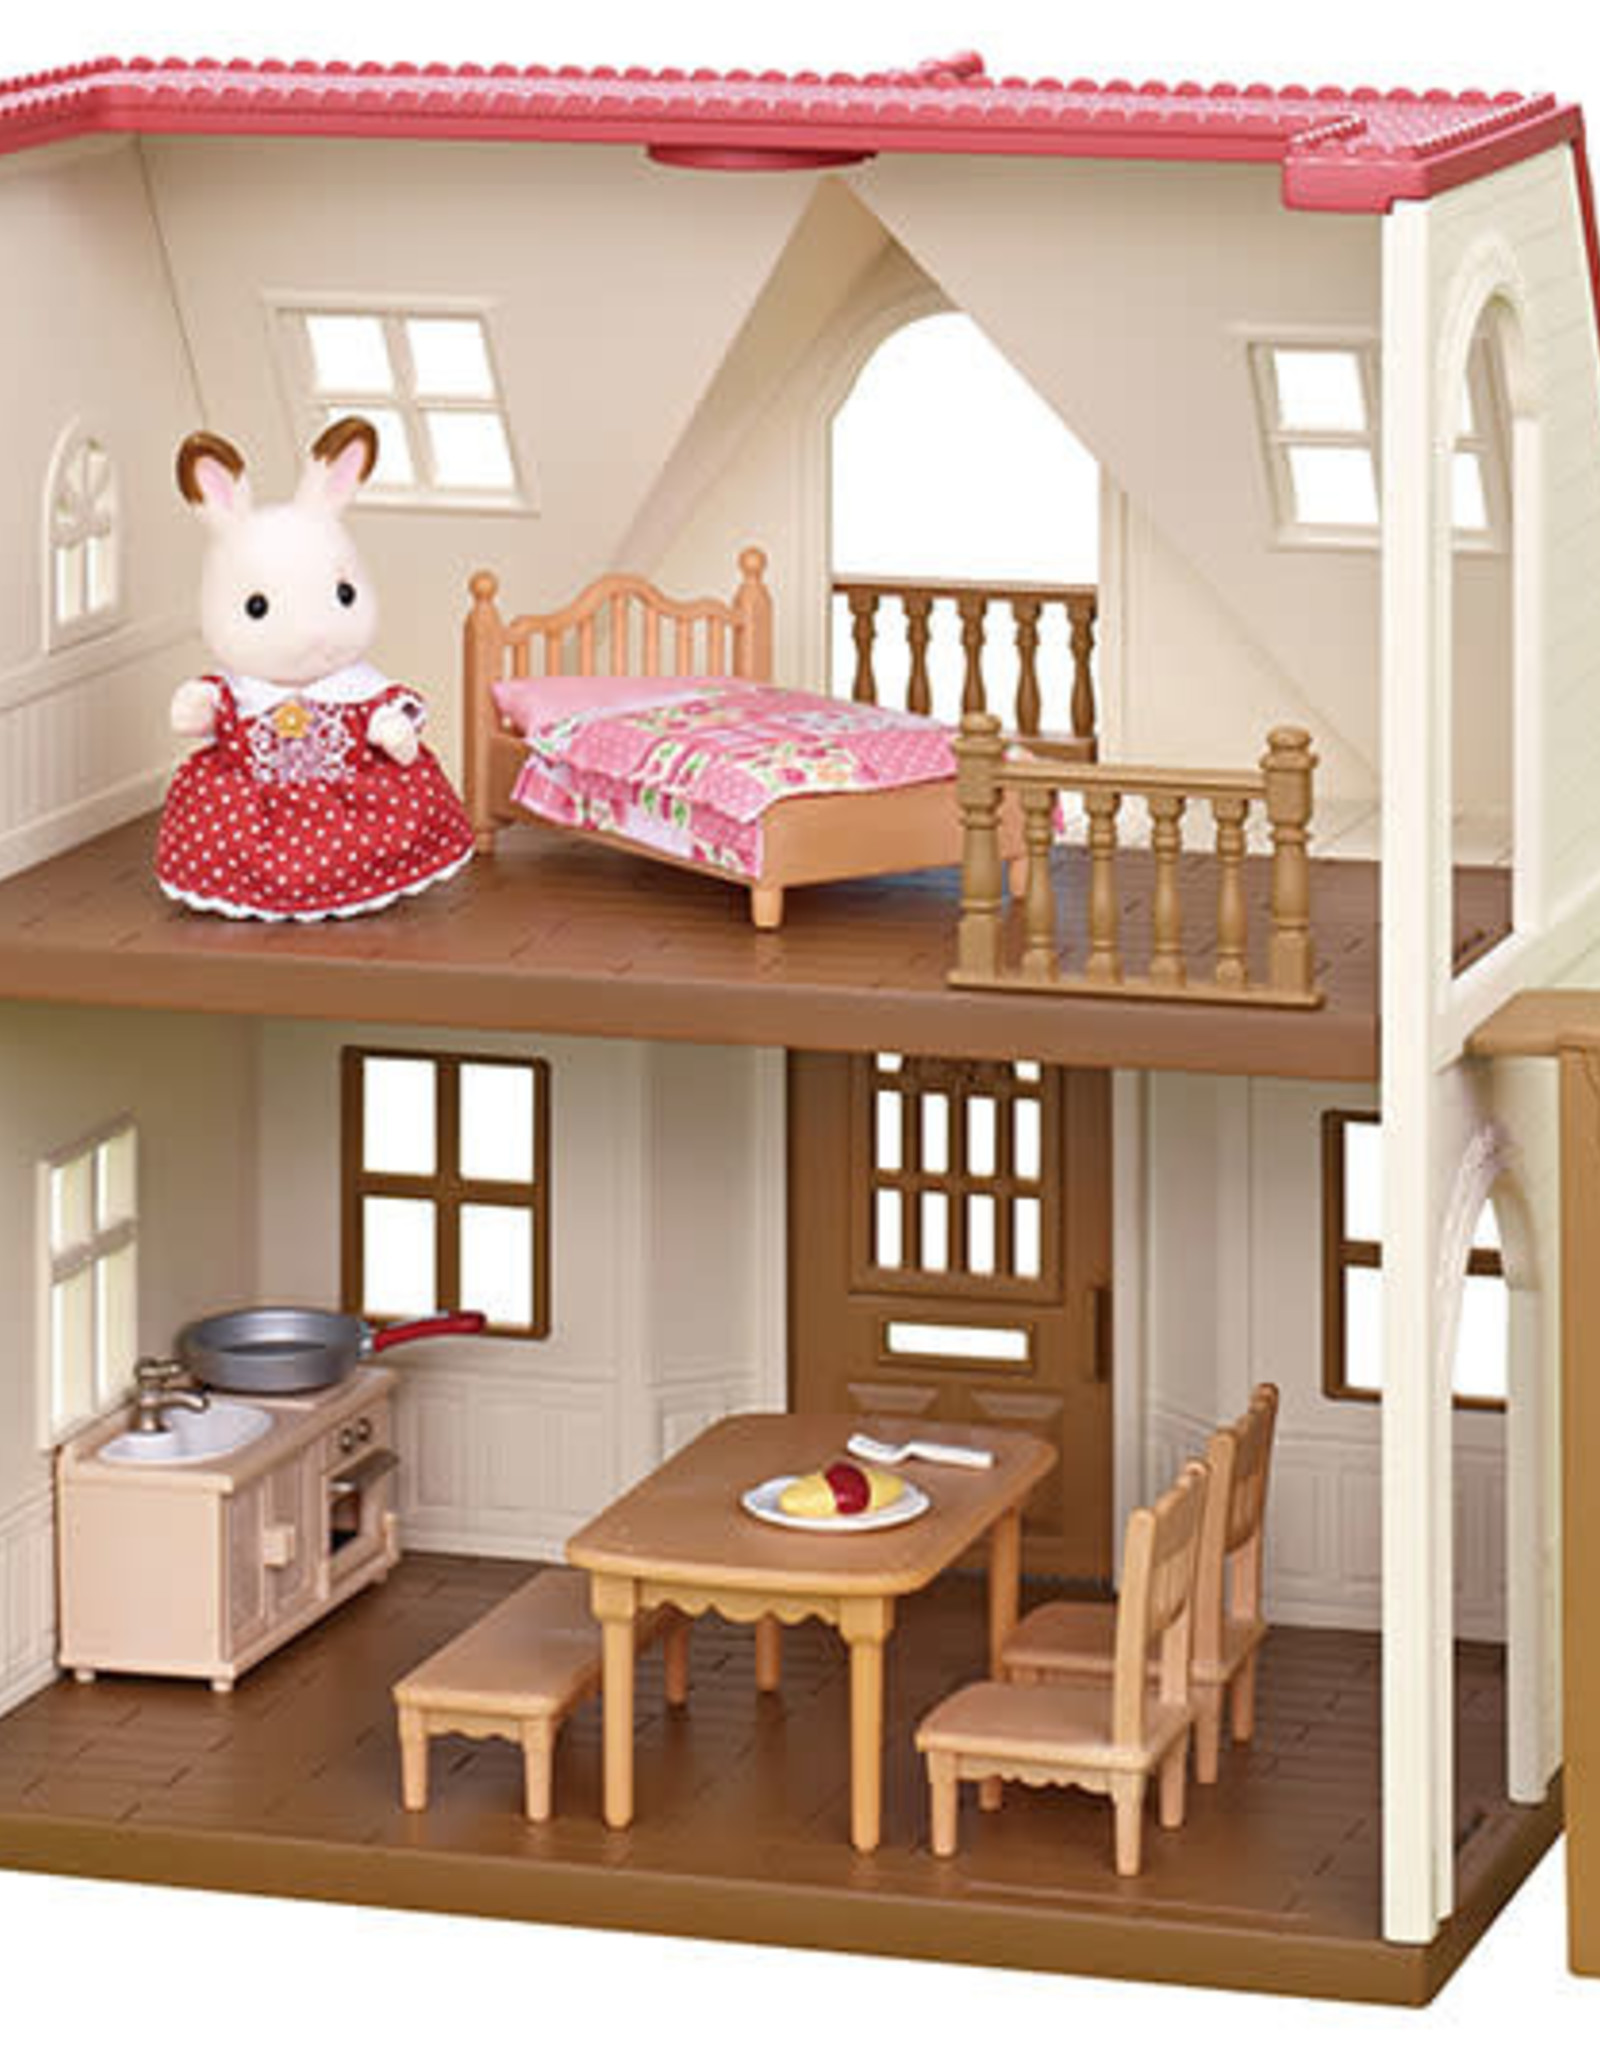 Calico Critters CC Cozy Cottage